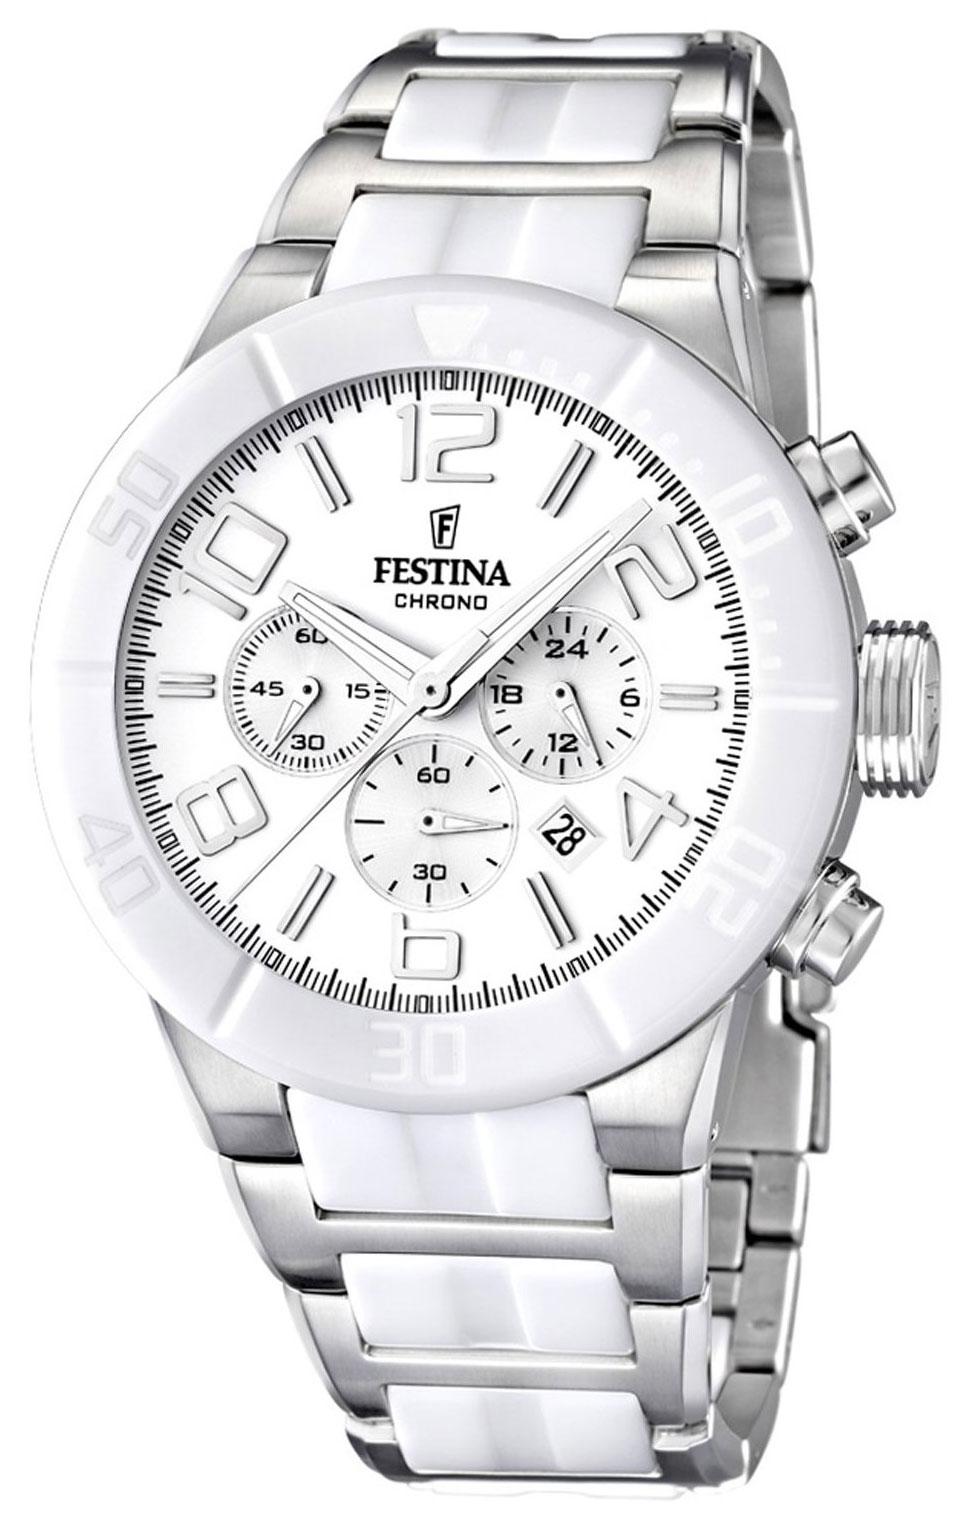 Chrono Festina F16576/1